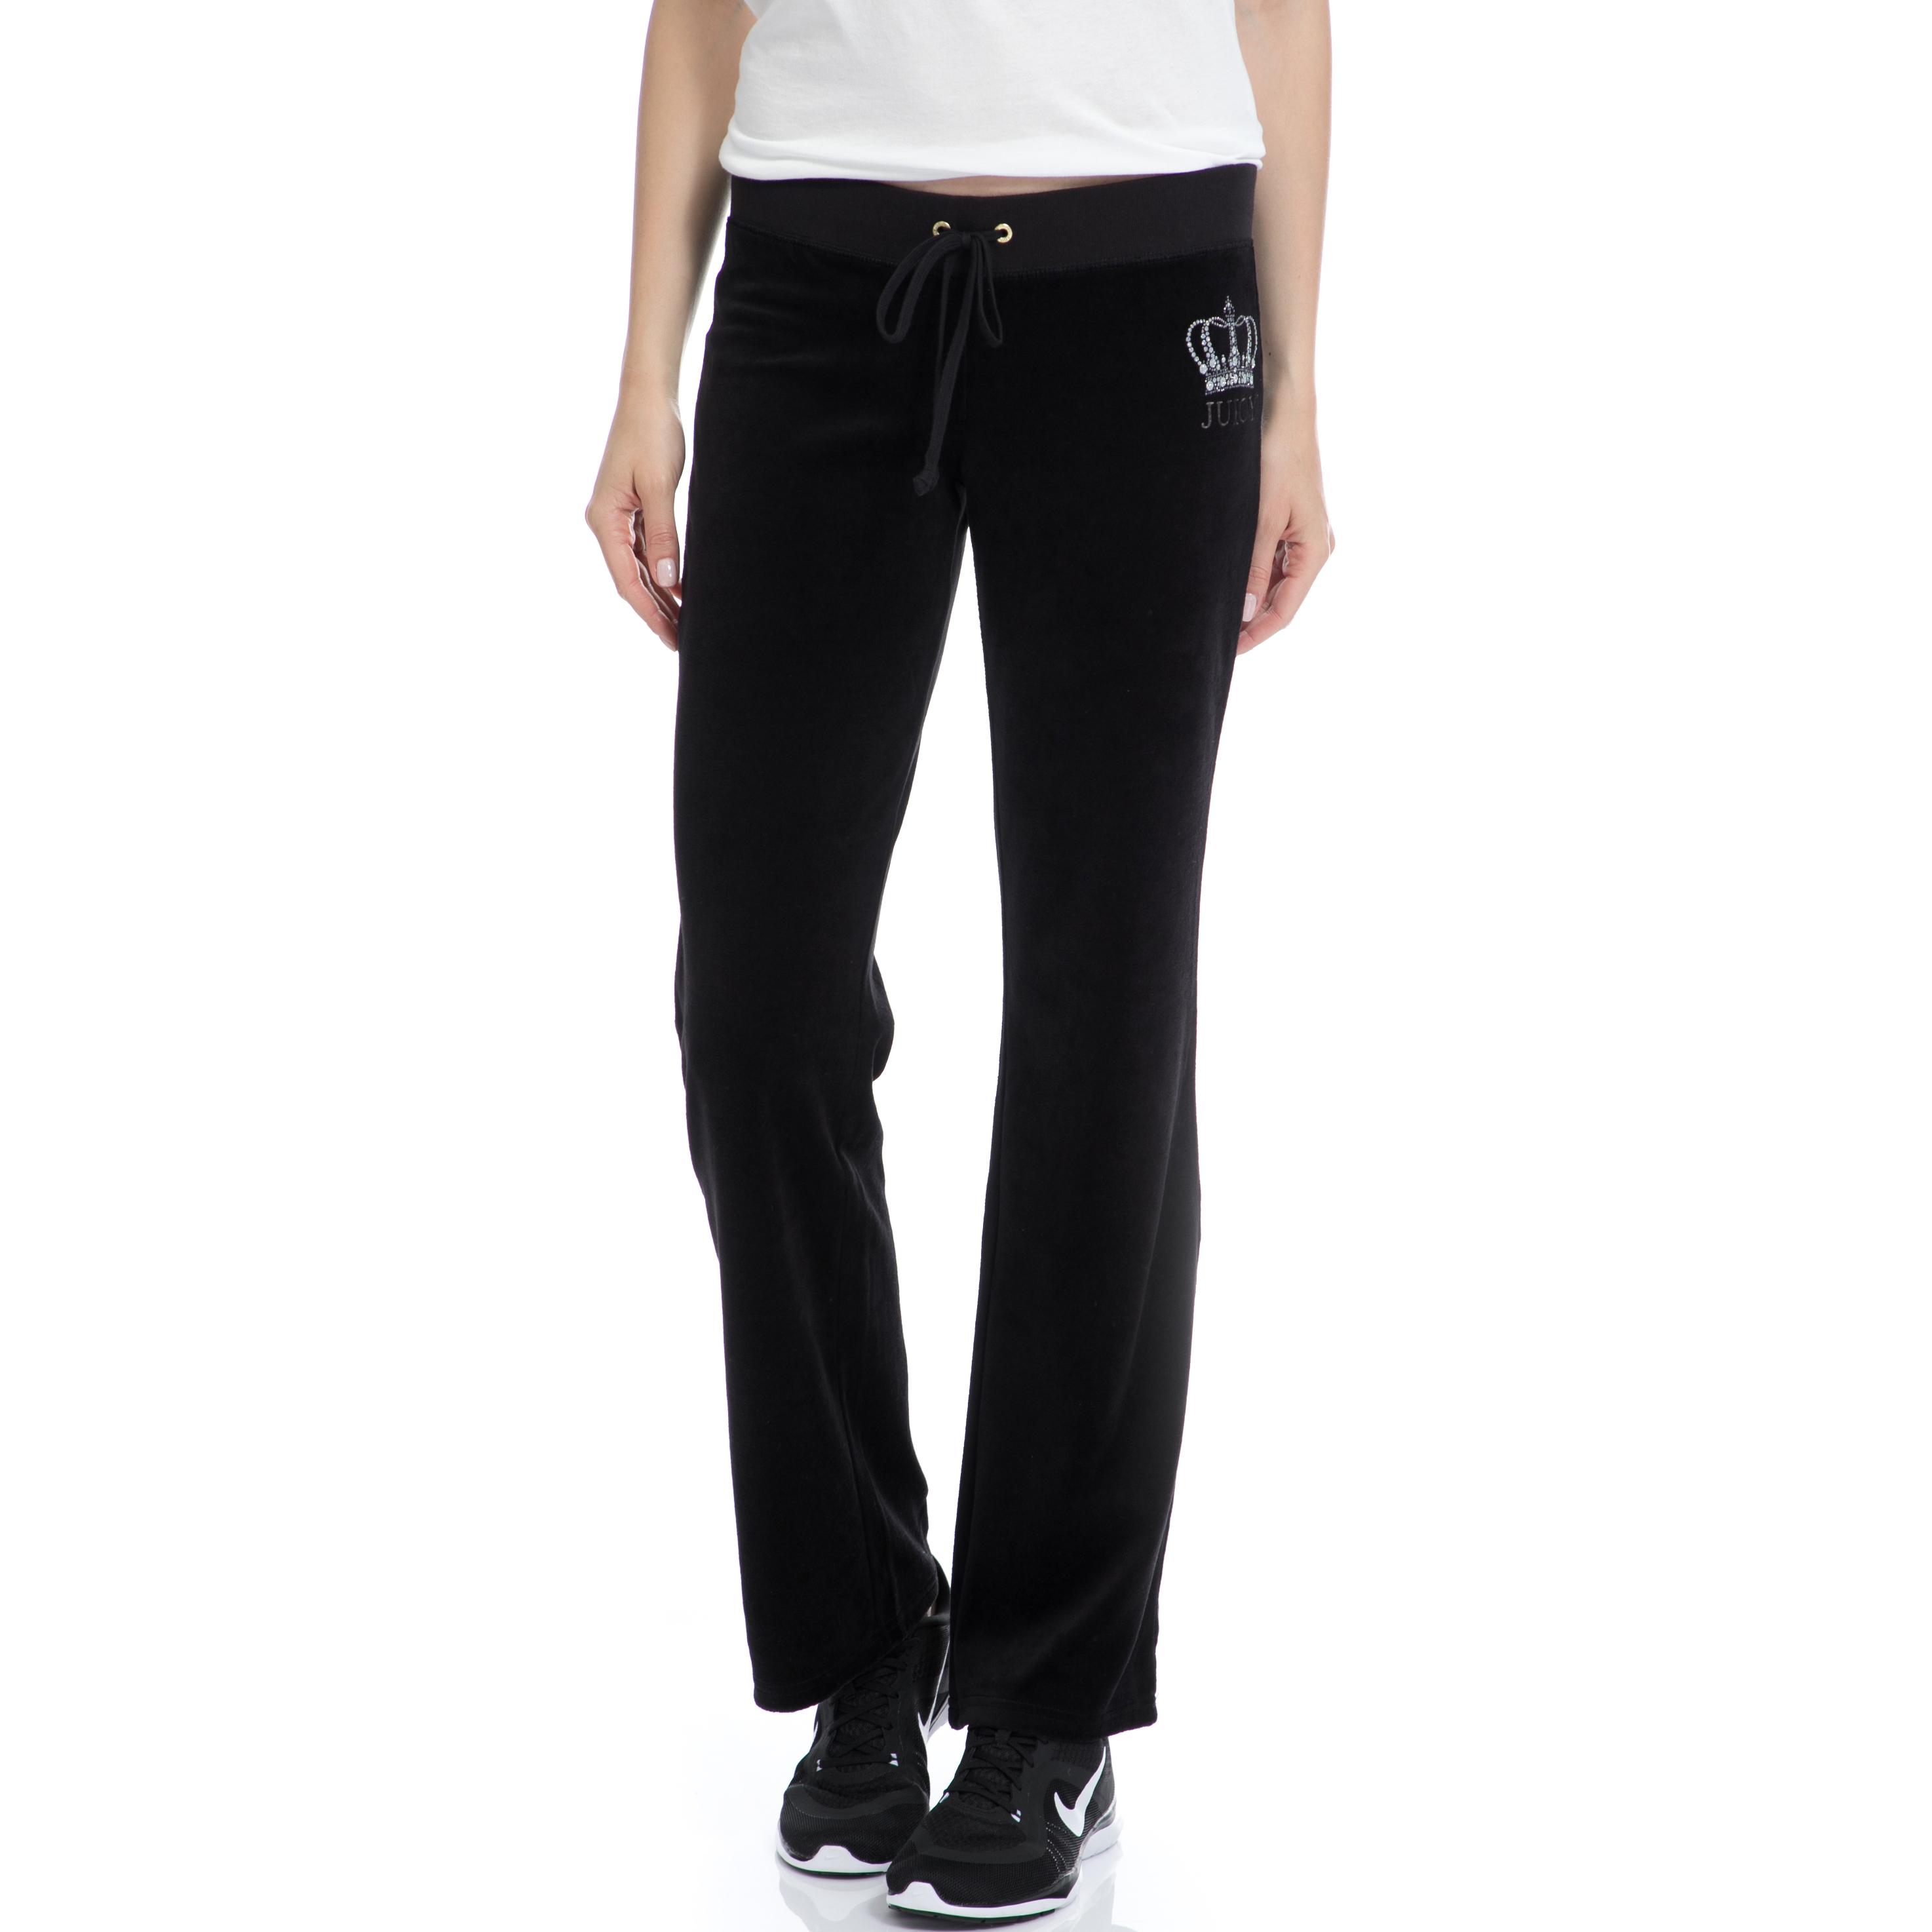 JUICY COUTURE – Γυναικείο παντελόνι Juicy Couture μαύρο